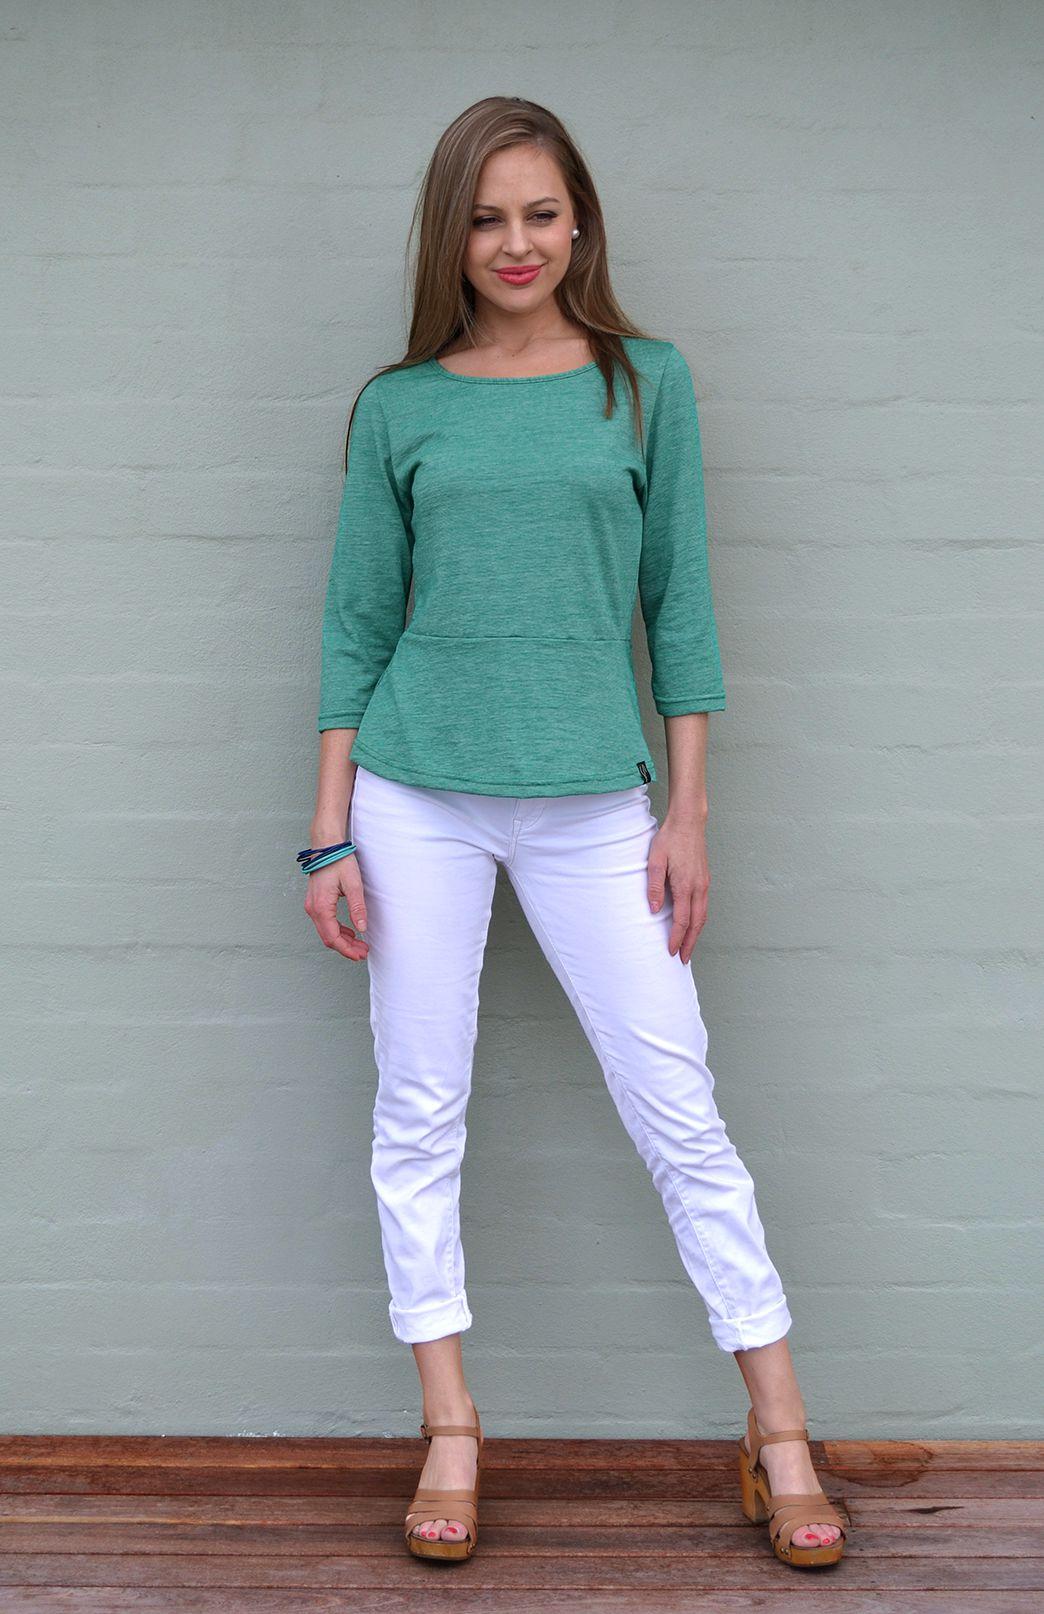 Peplum Top - 3/4 Sleeve - Women's Green Pinstripe Wool Cotton Blend 3/4 Sleeve Spring Top - Smitten Merino Tasmania Australia